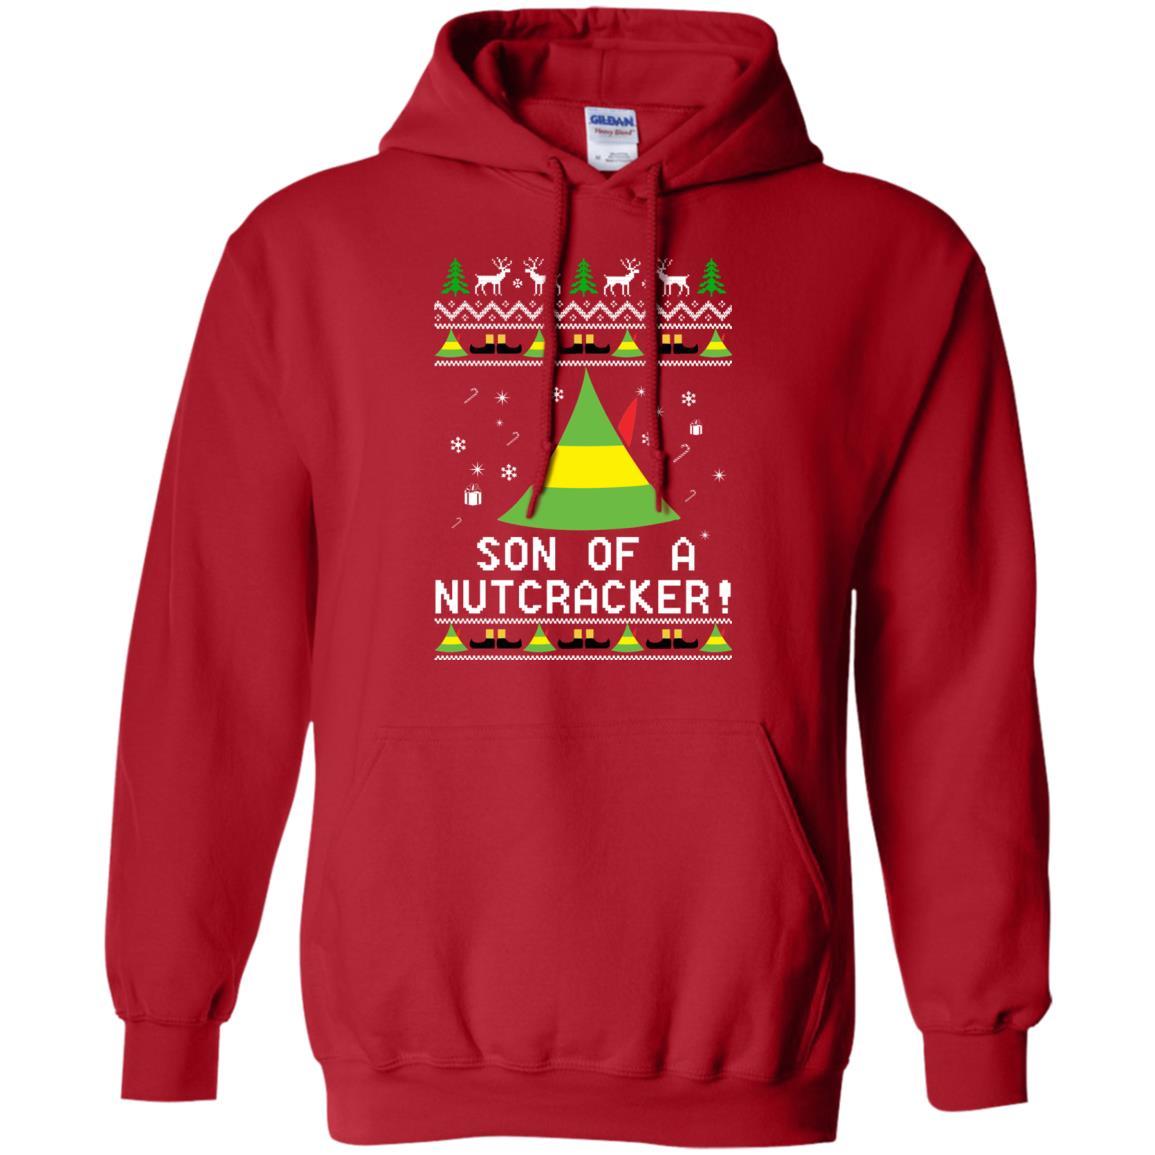 image 1981 - Son of a Nutcracker Elf Christmas Sweatshirt, Ugly Sweater